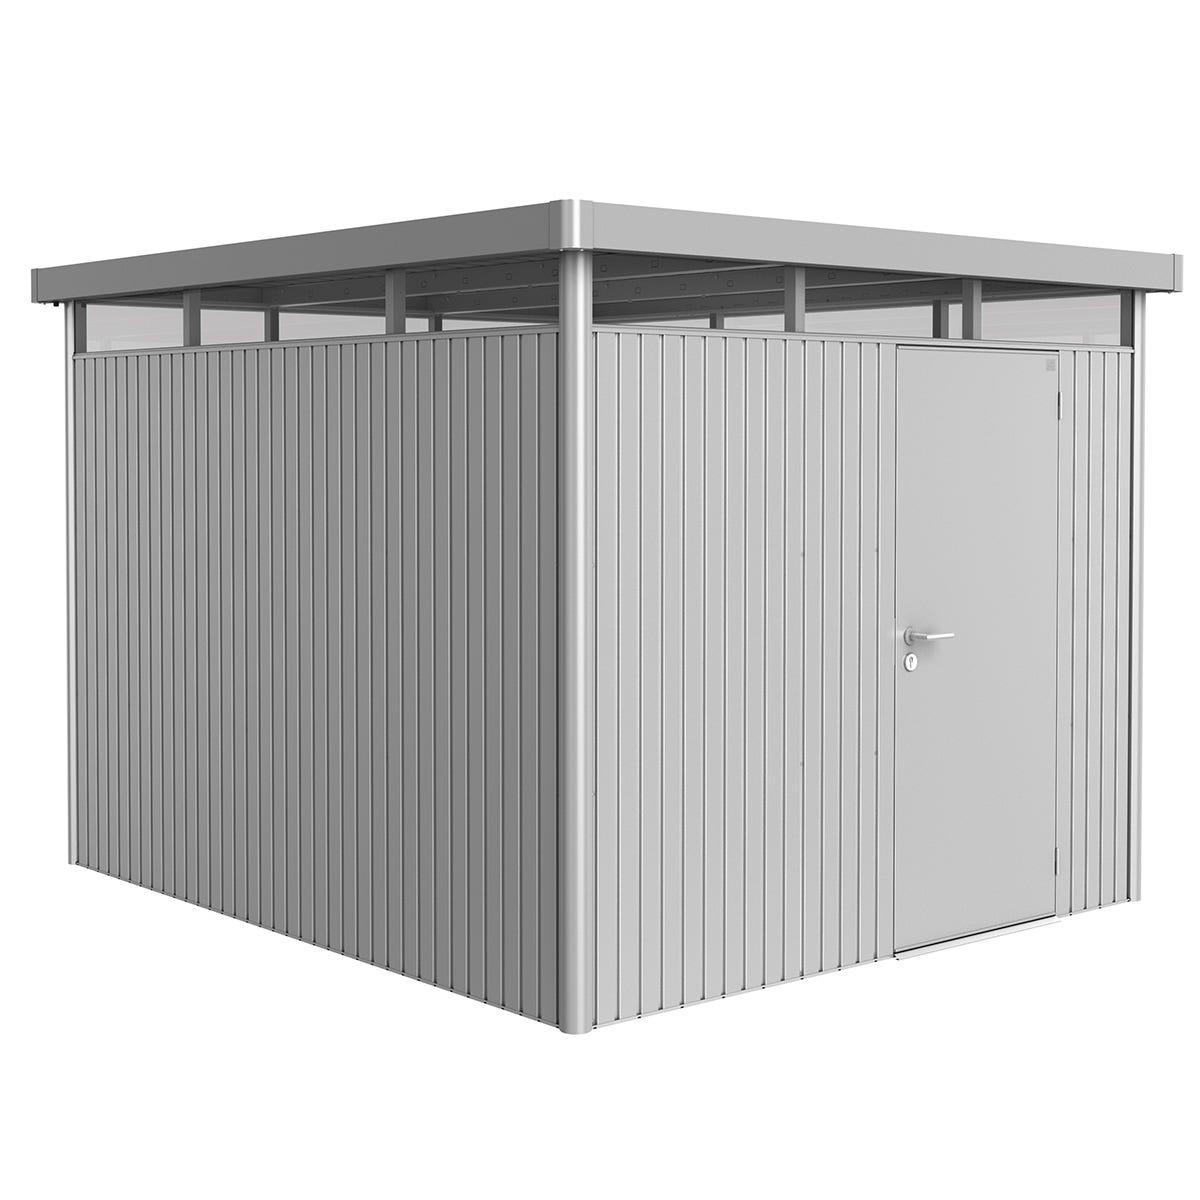 Biohort Highline Metal Shed H5 Standard door 9 x 10 - Metallic Silver